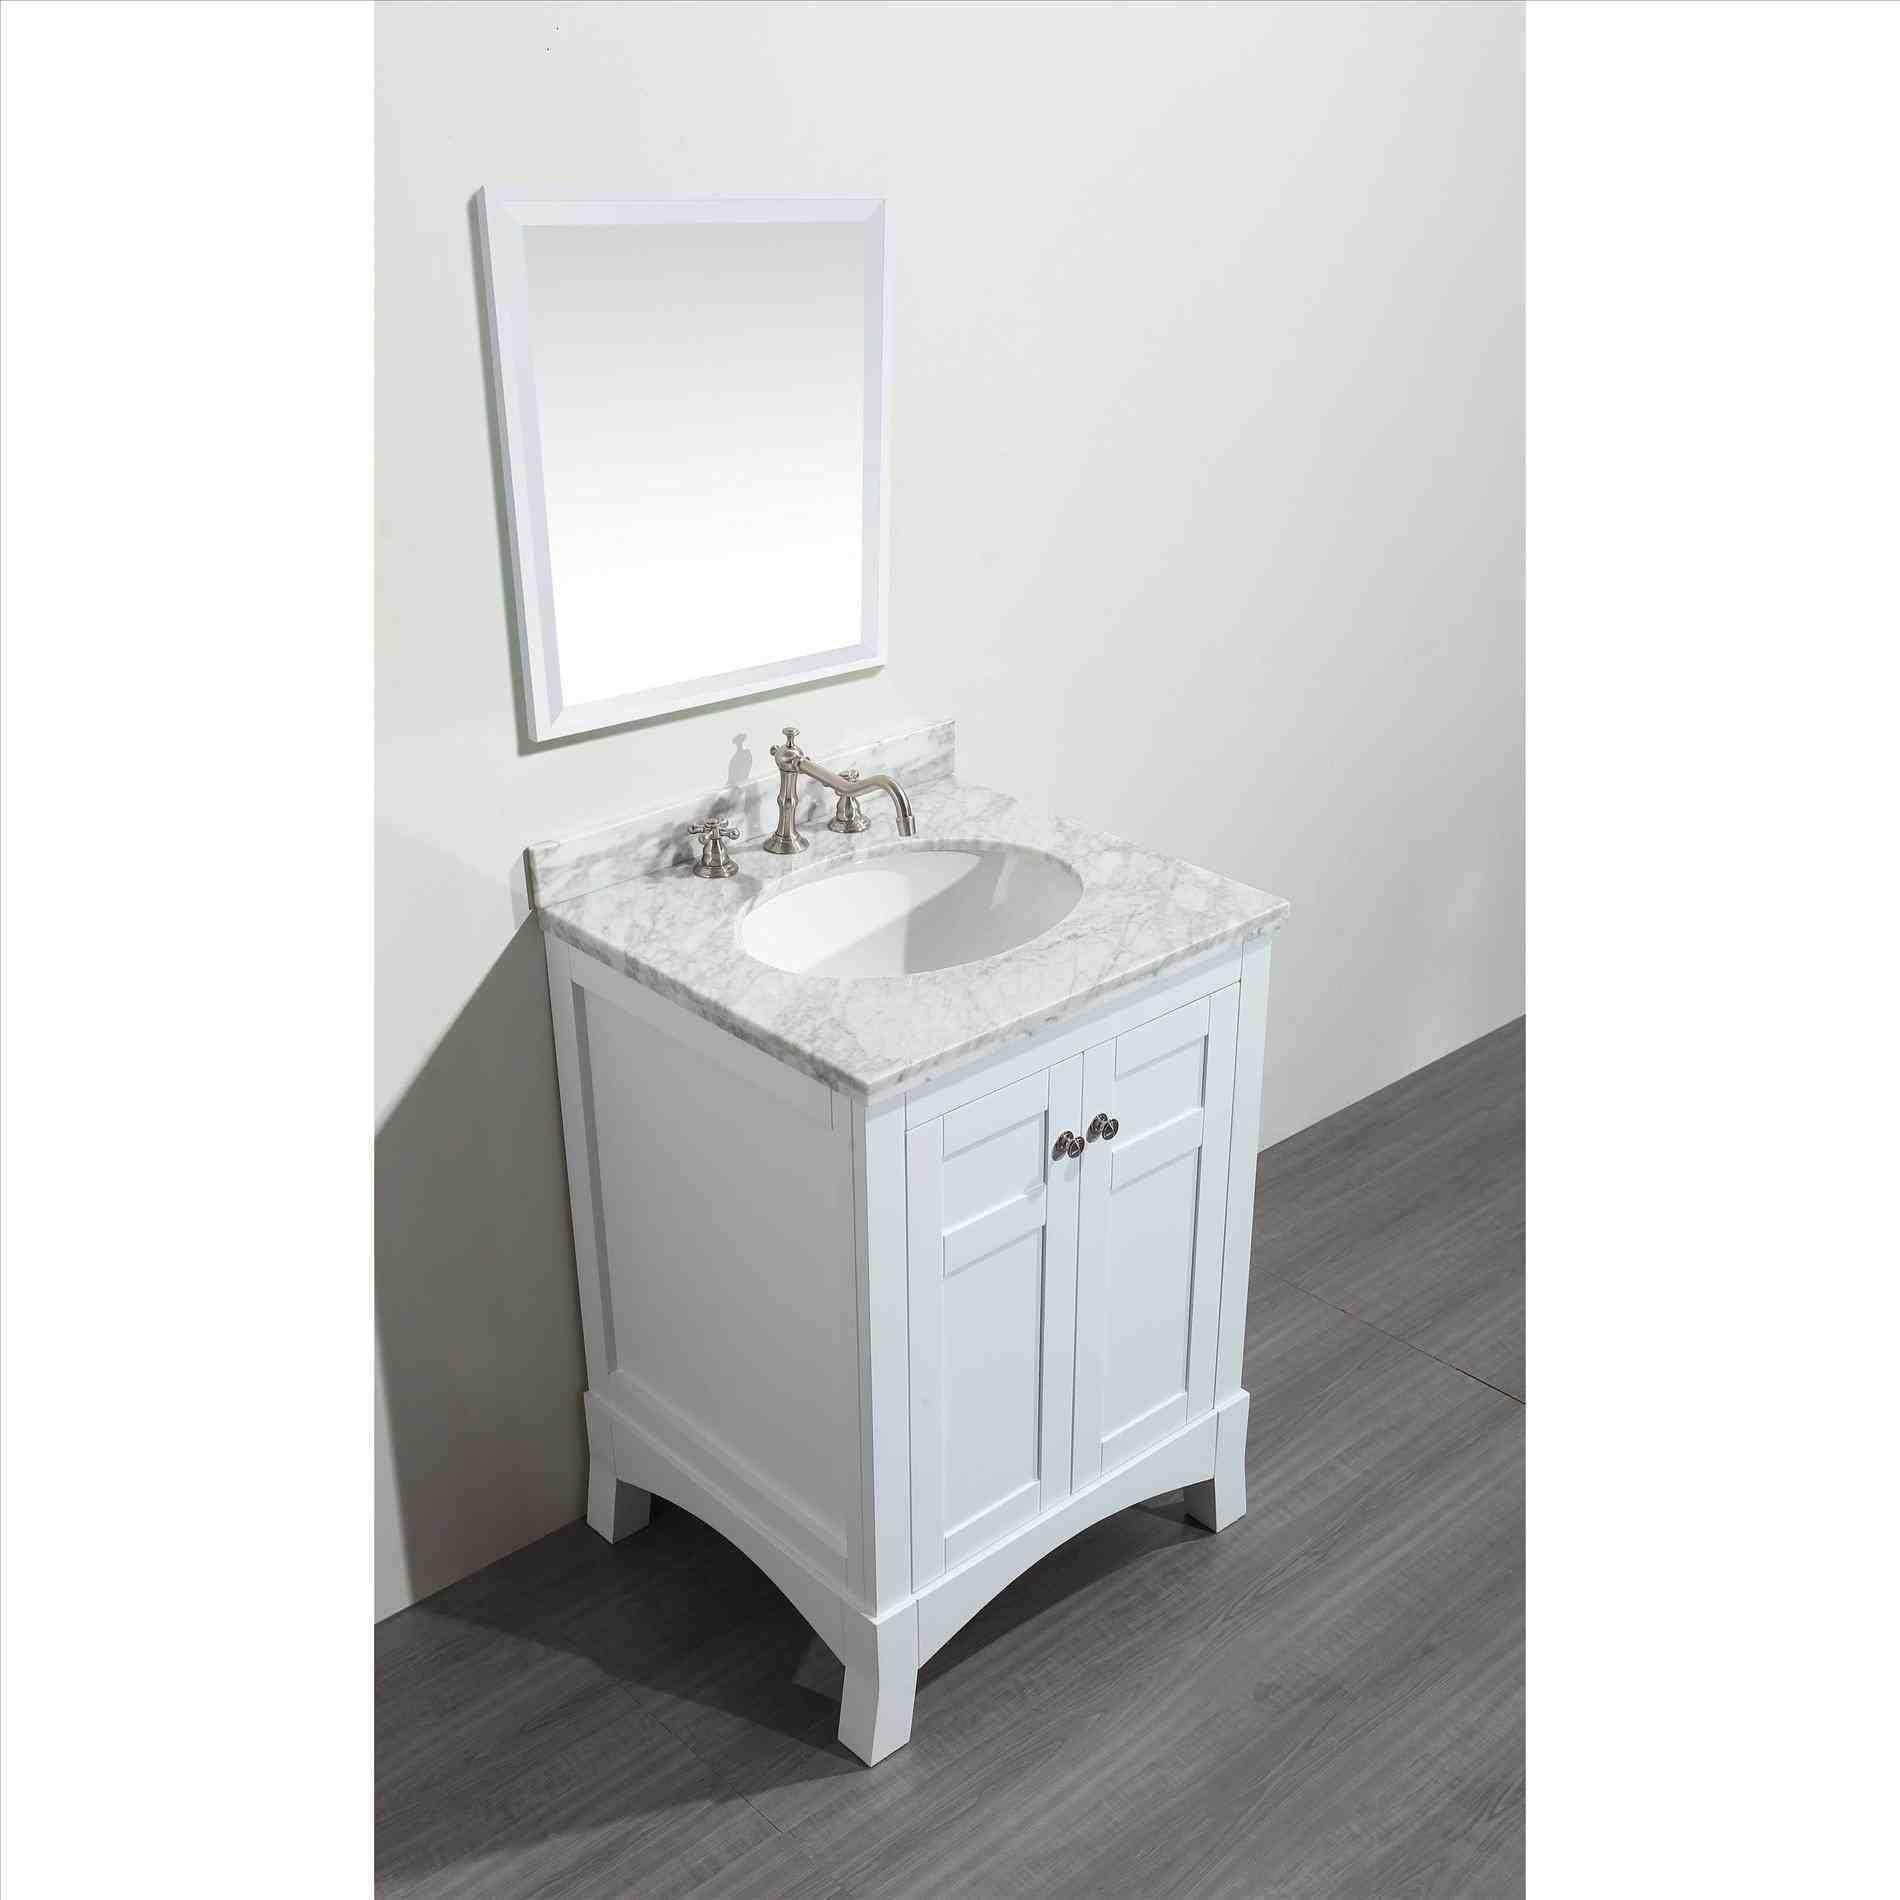 New Post 24 Inch Bathroom Vanity Lowes